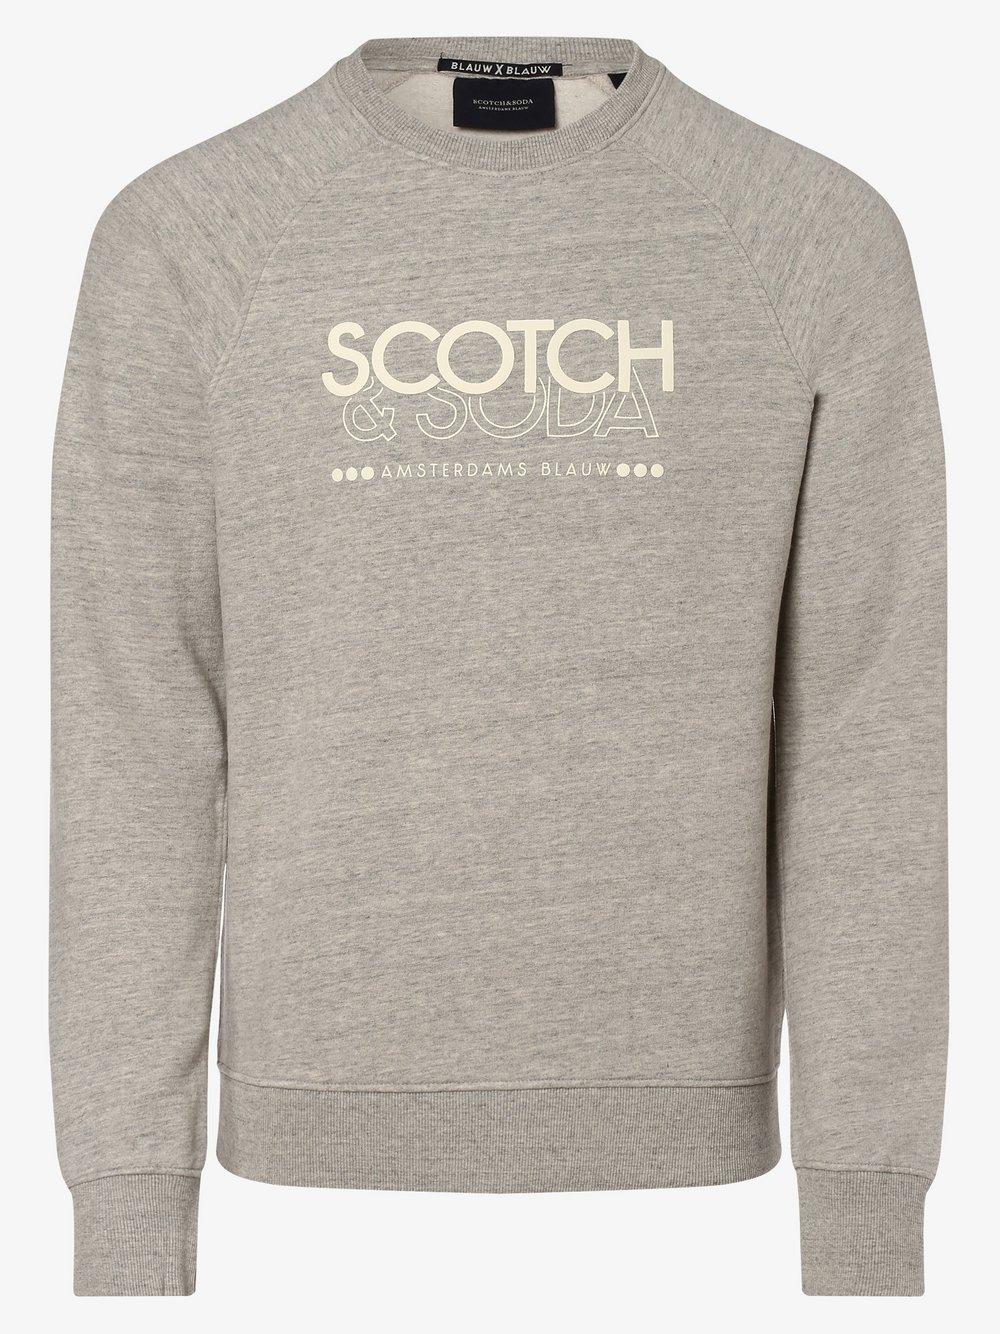 Scotch & Soda - Męska bluza nierozpinana, szary